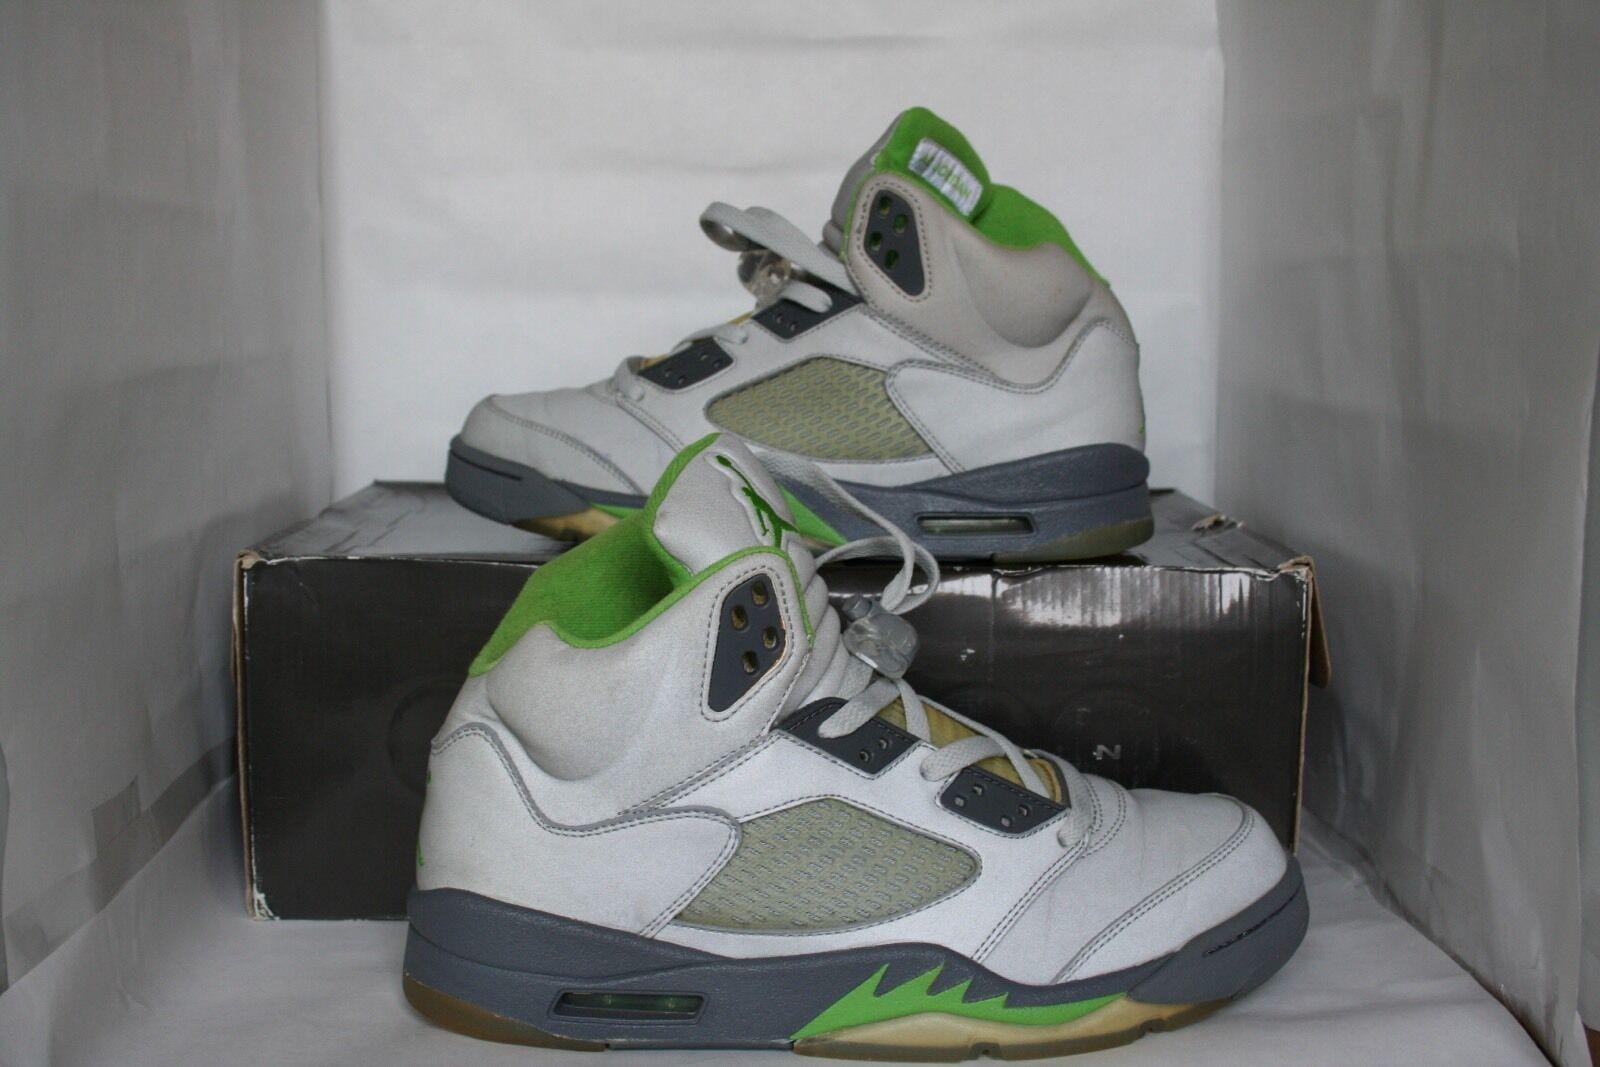 Nike Nike Nike Air Jordan V 5 Retro Size 9.5 Green Bean (3M Reflective) 2006 Used Supreme ce79eb